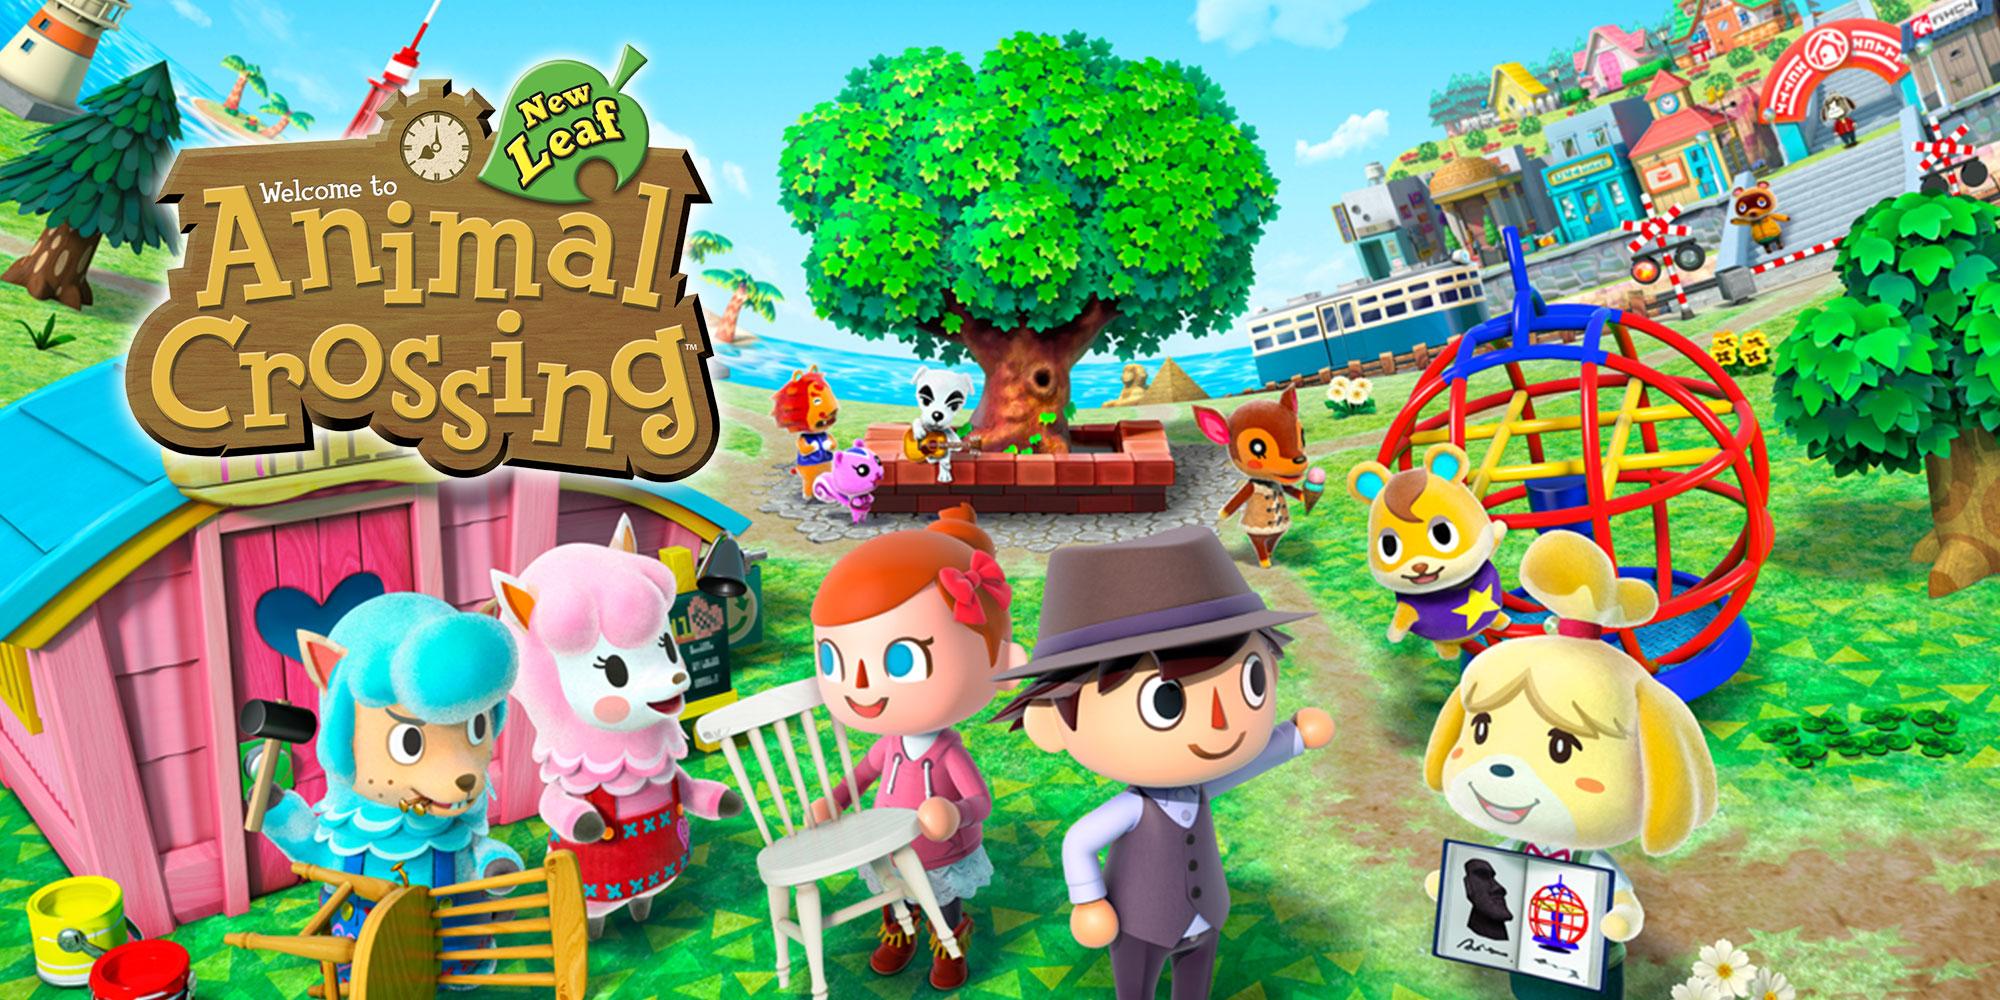 animal_crossing : Games like harvest moon